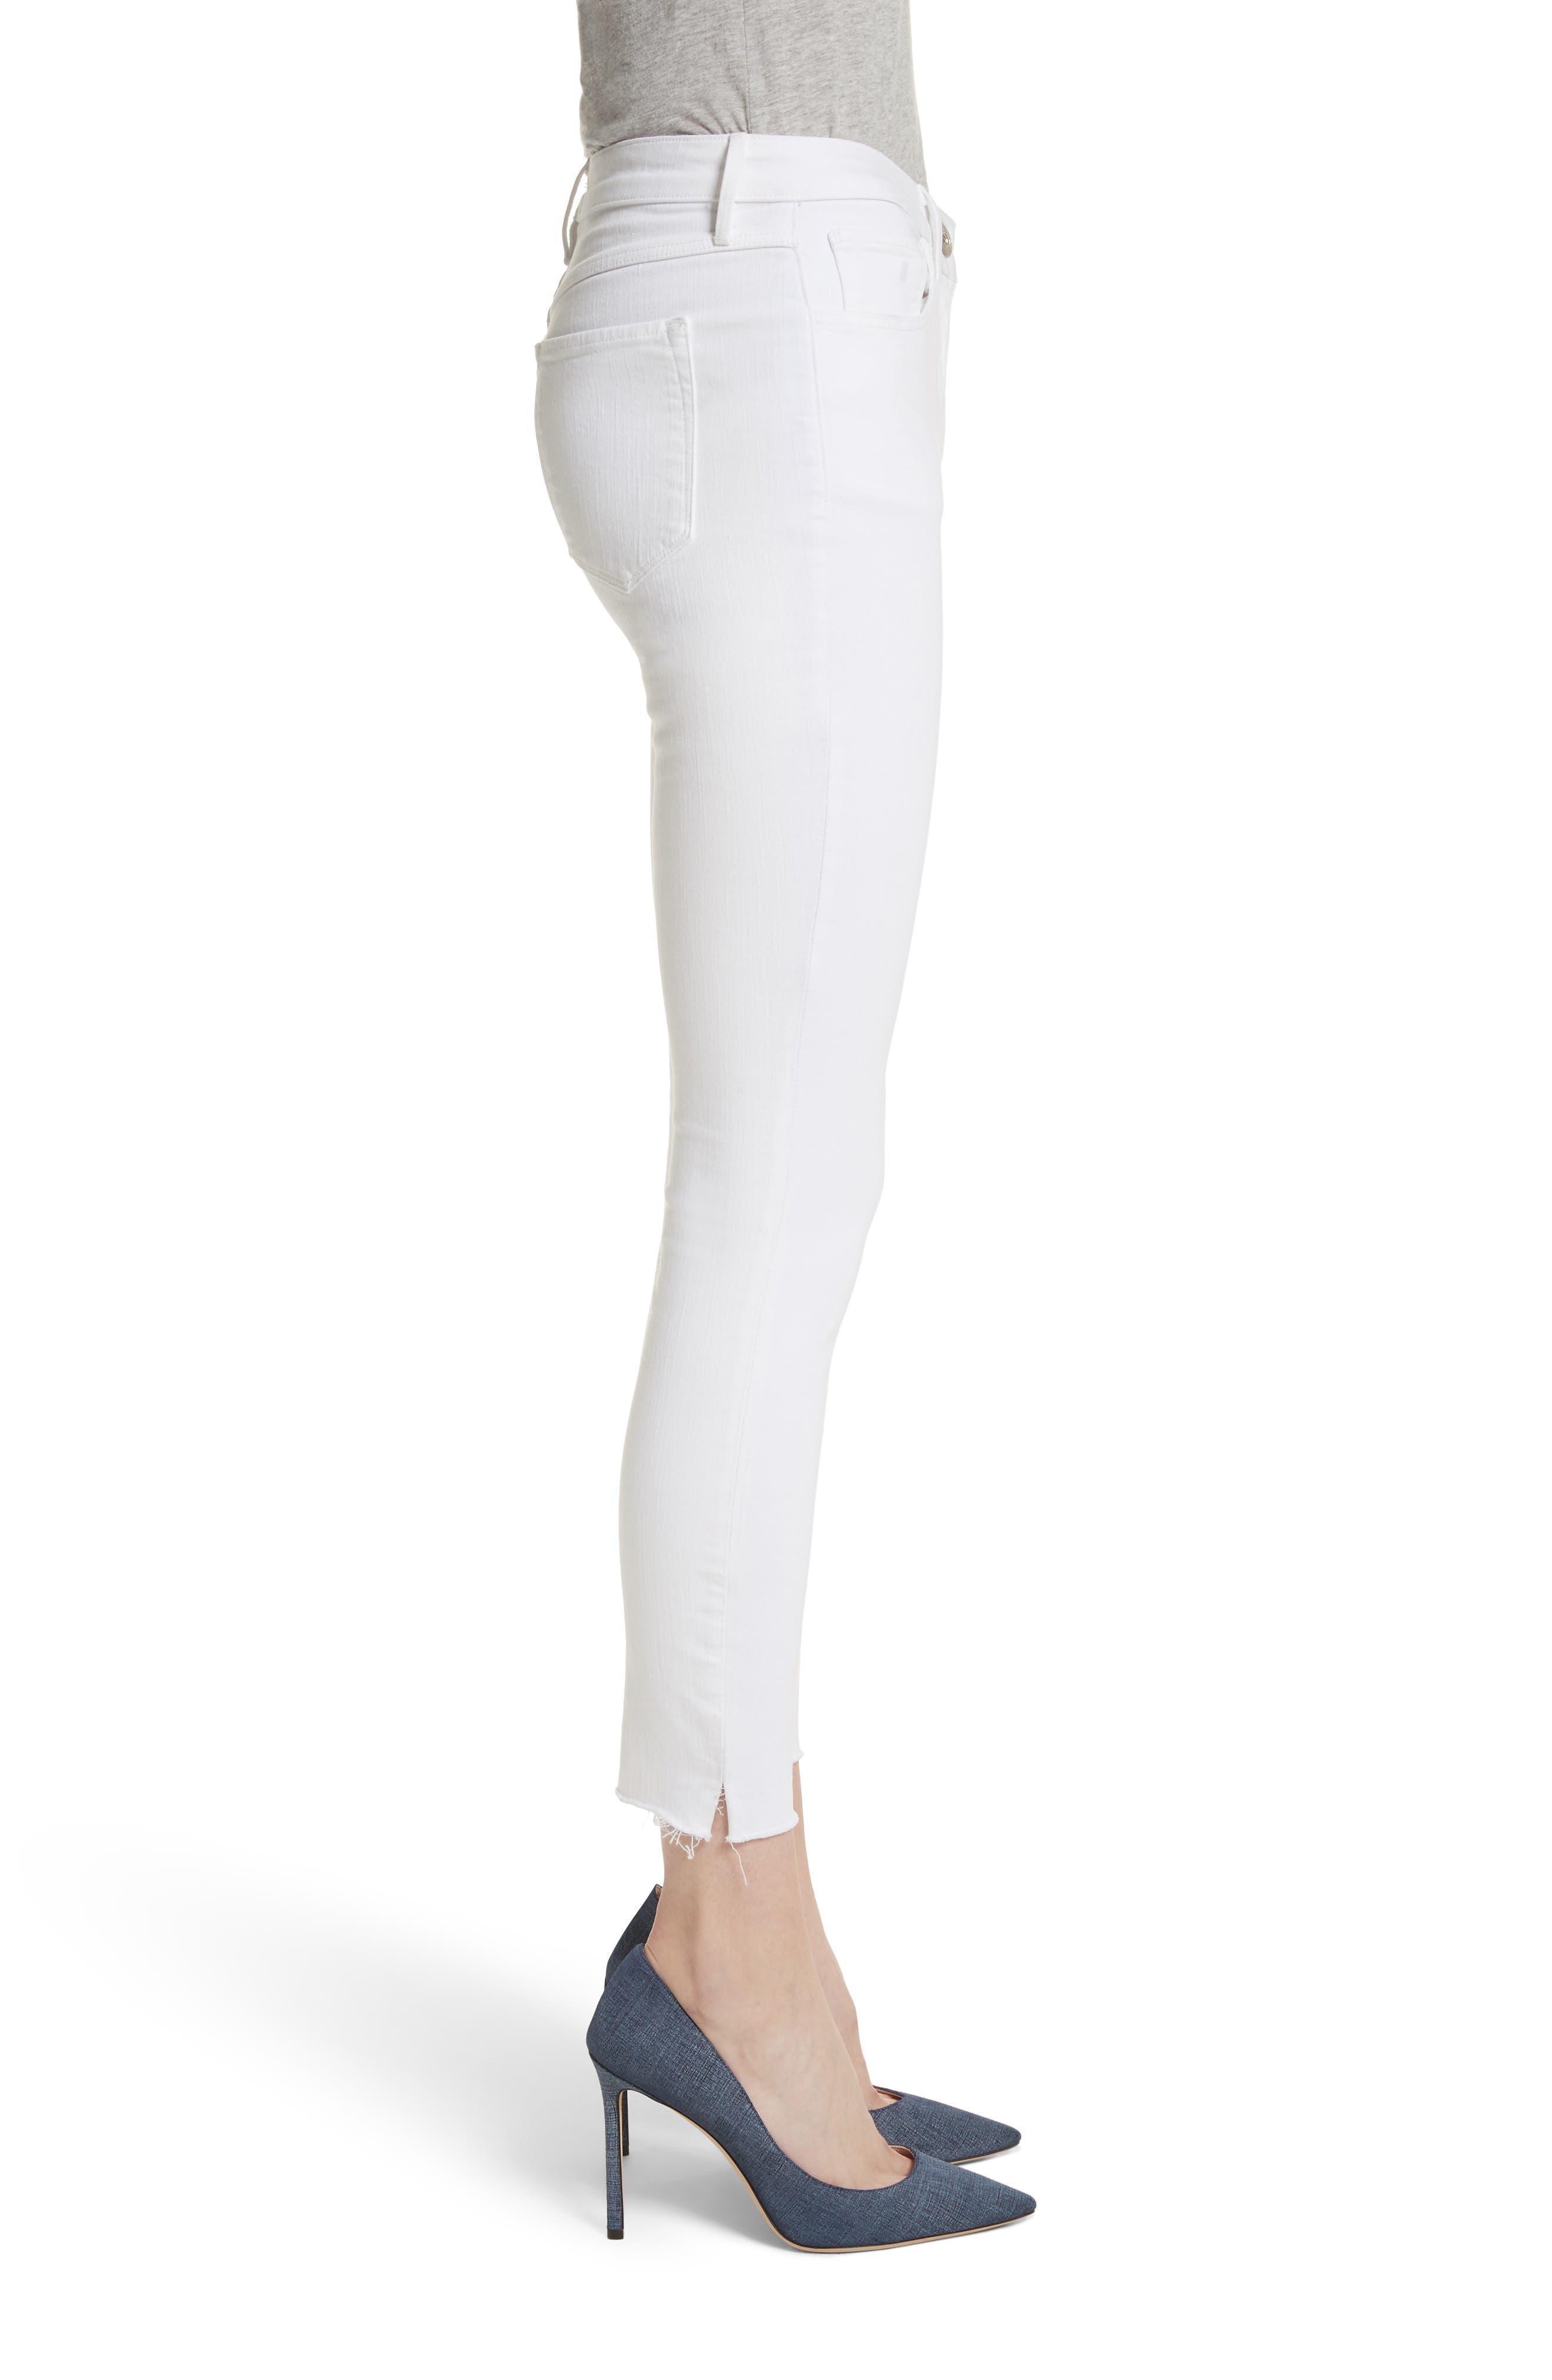 W2 Crop Skinny Jeans,                             Alternate thumbnail 3, color,                             White Tear